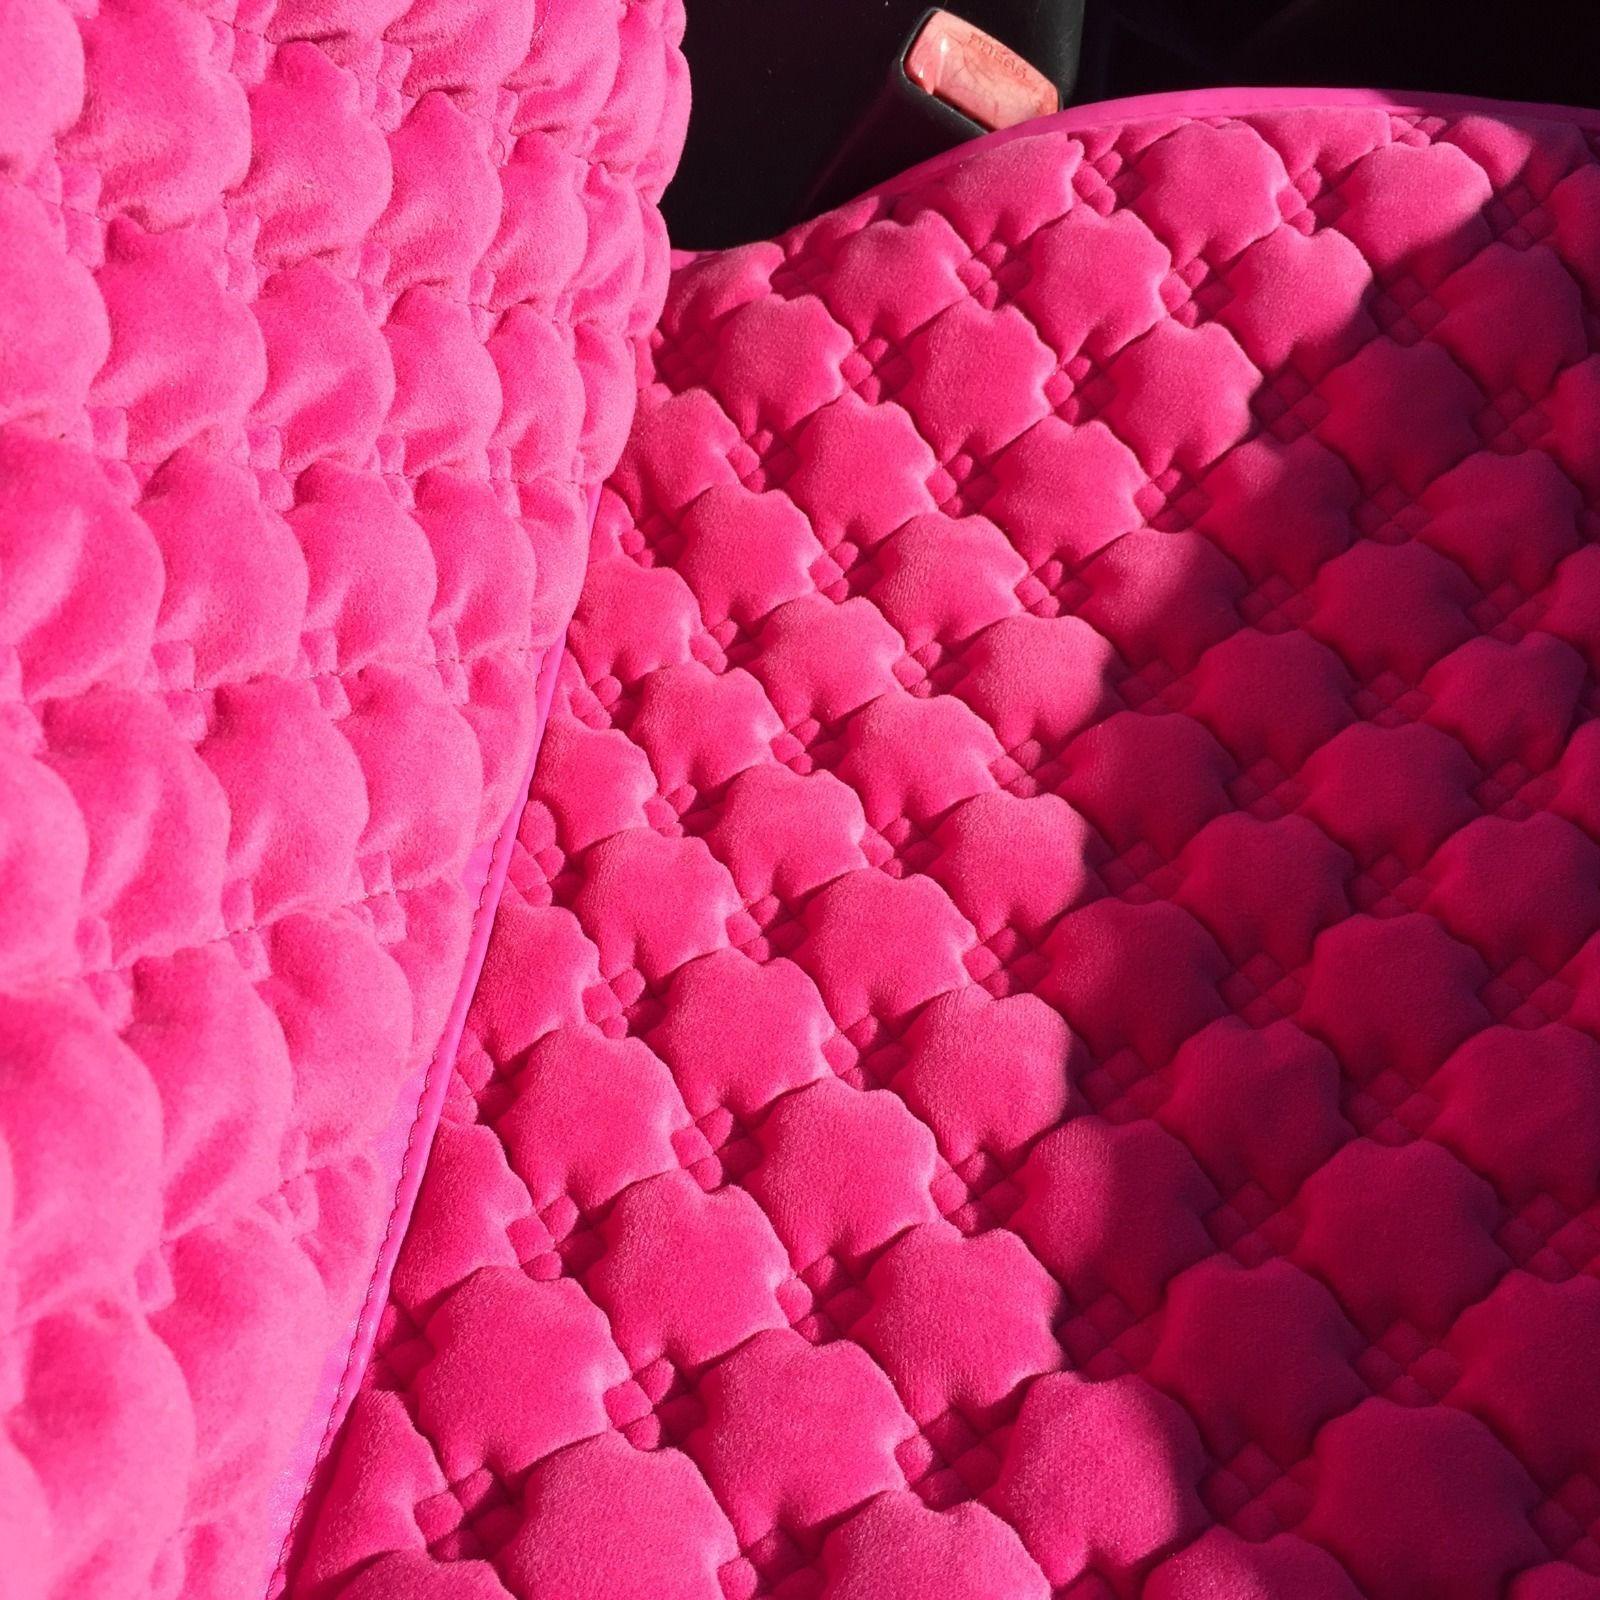 Range Rover Pink #pinkrangerovers Range Rover Pink #pinkrangerovers